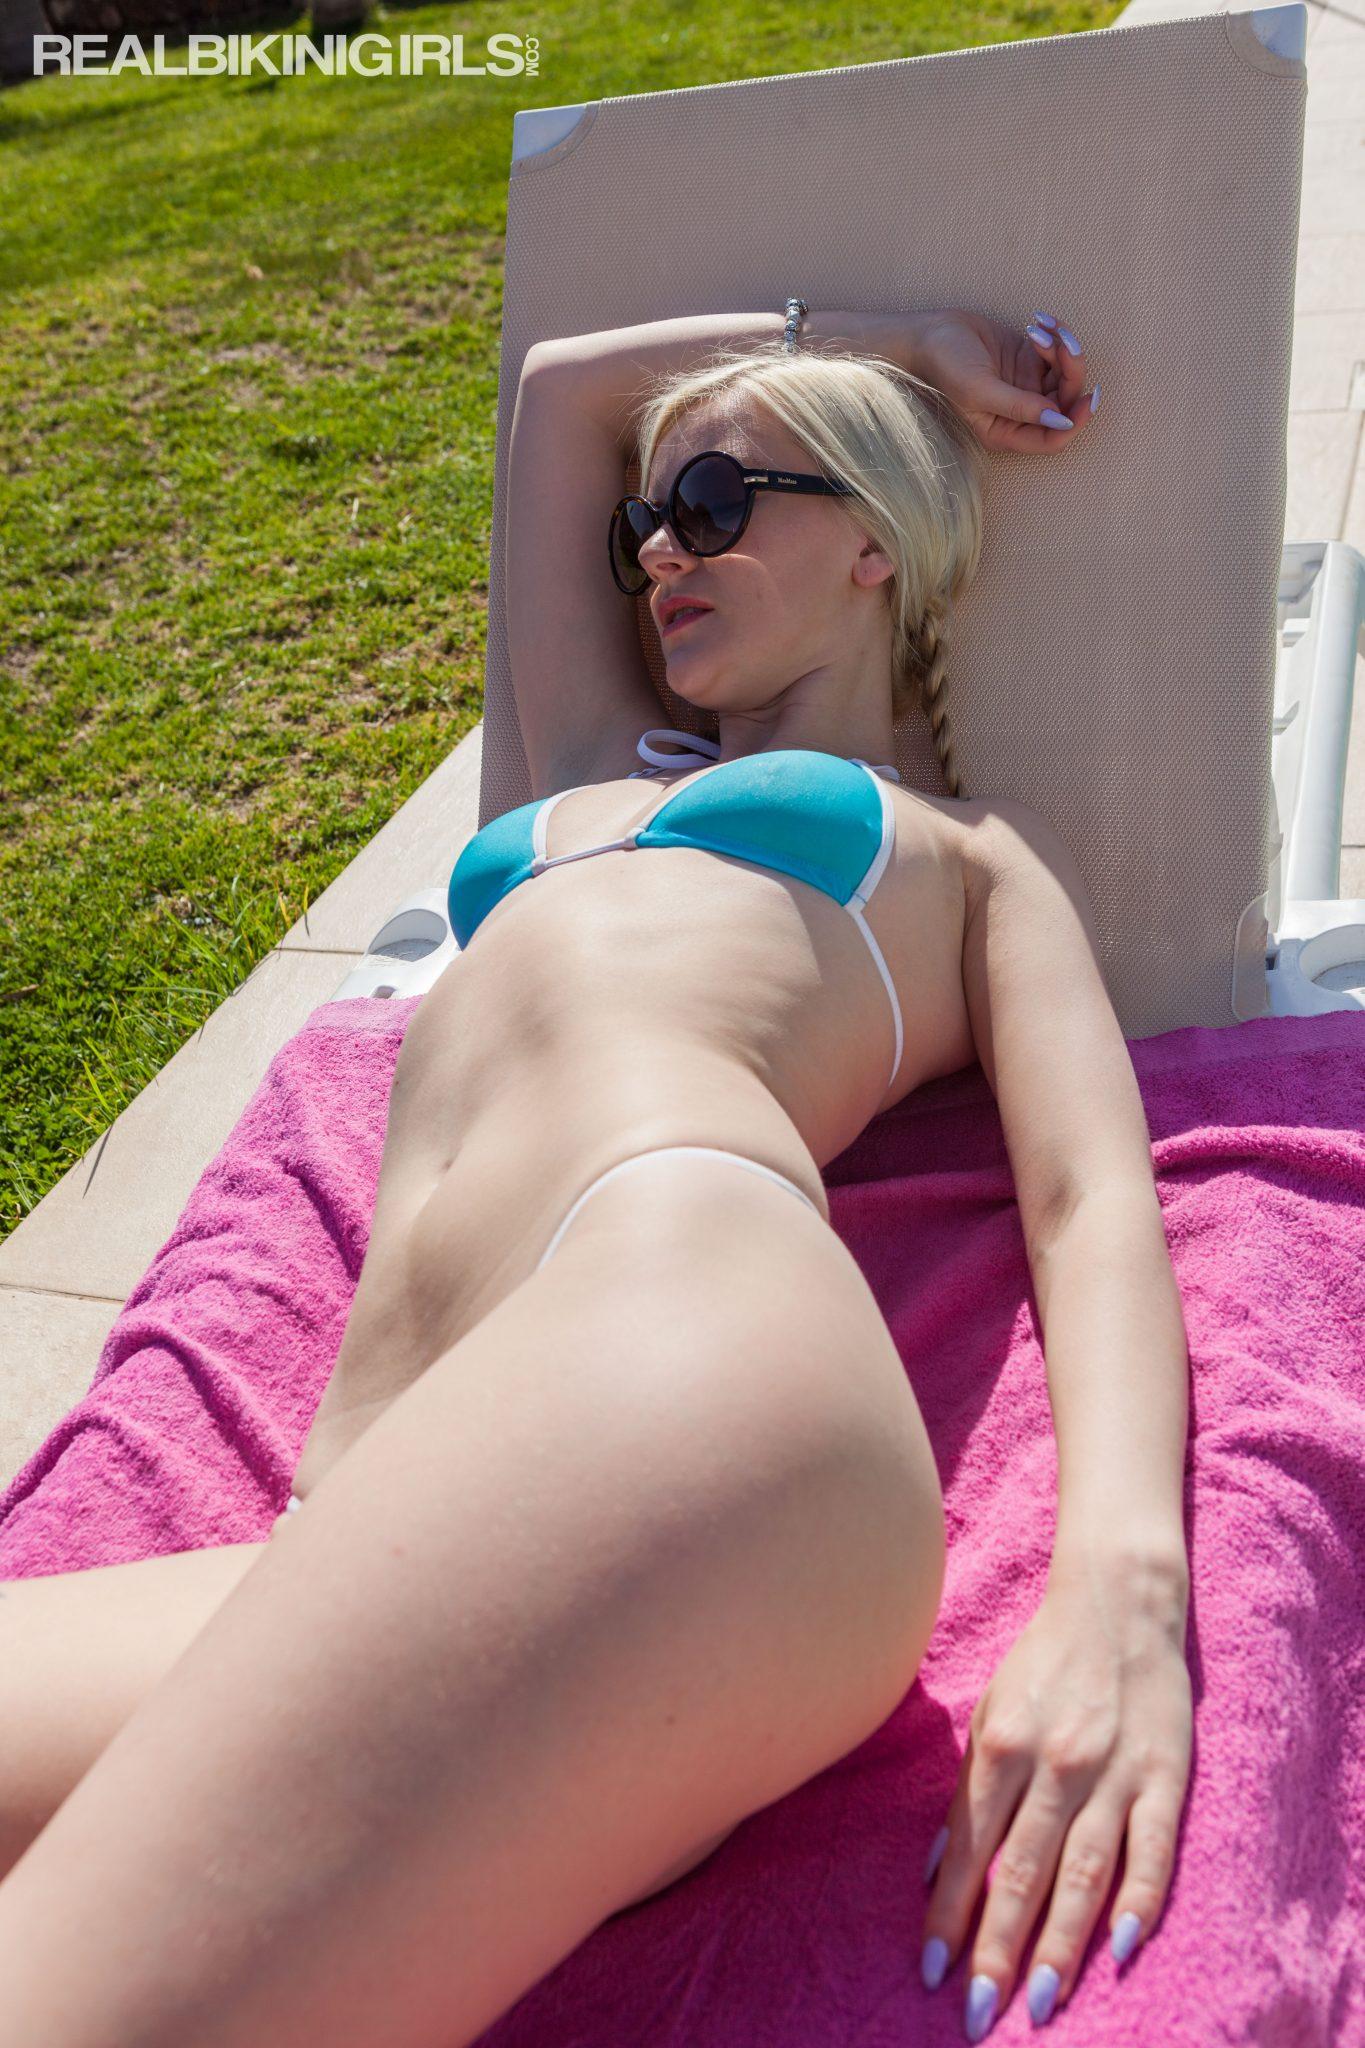 Week 47 Photo Updates- Sheer Girls, Relaxation, Topless -5123